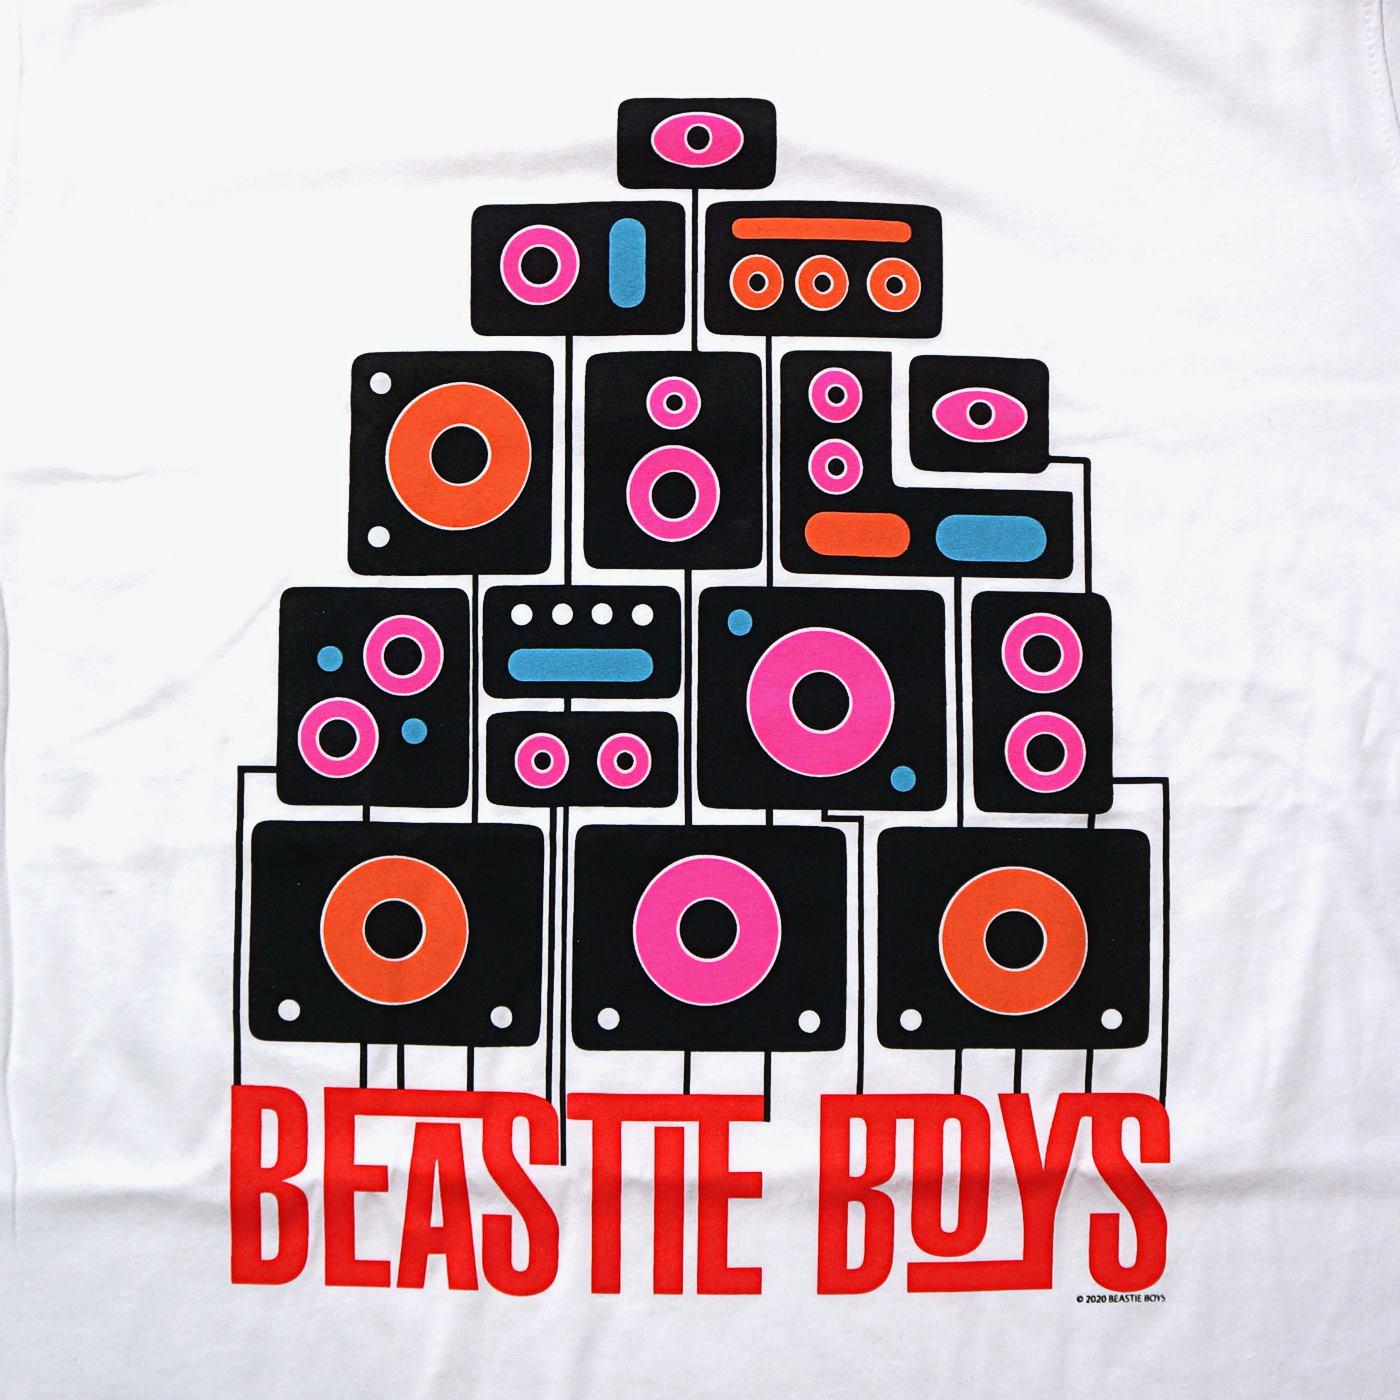 BEASTIE BOYS Tシャツ Tape-White